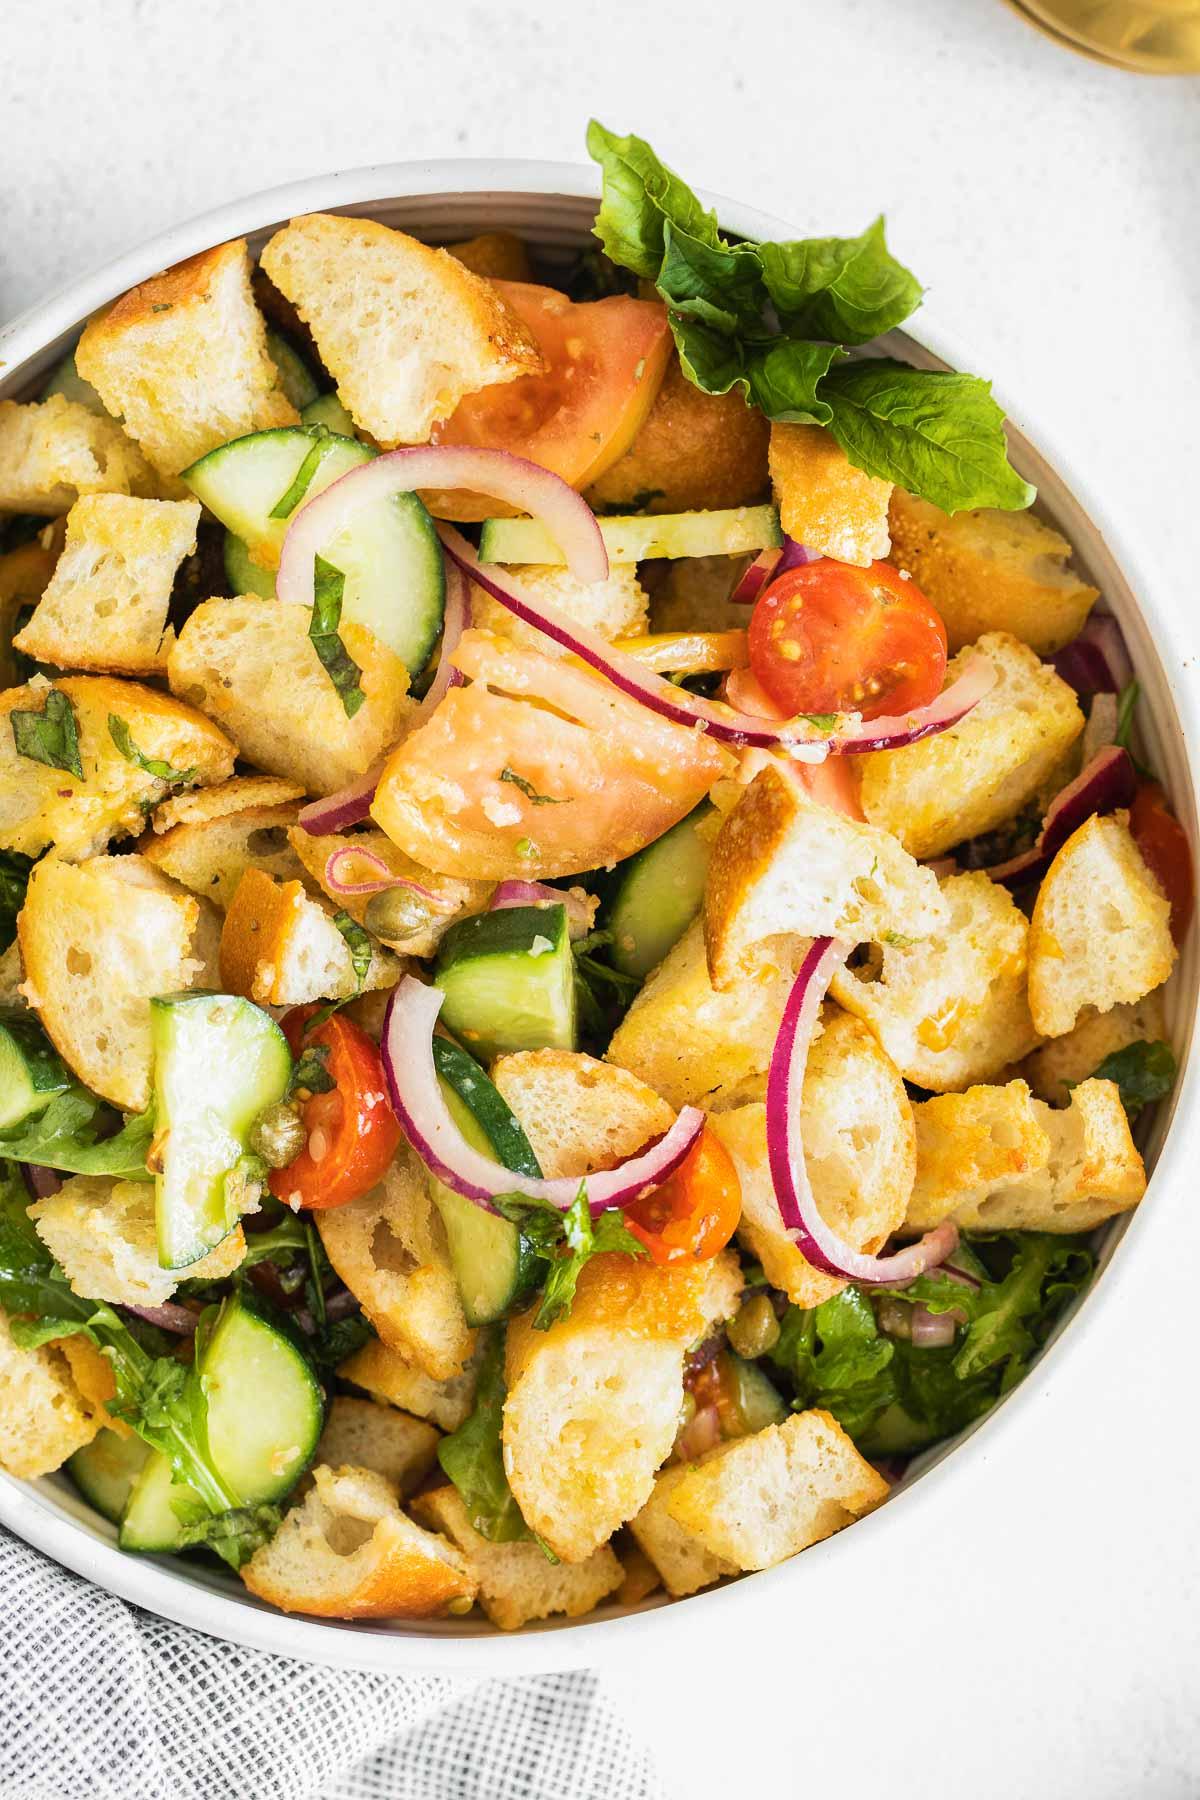 closeup panzanella salad with bread cubes